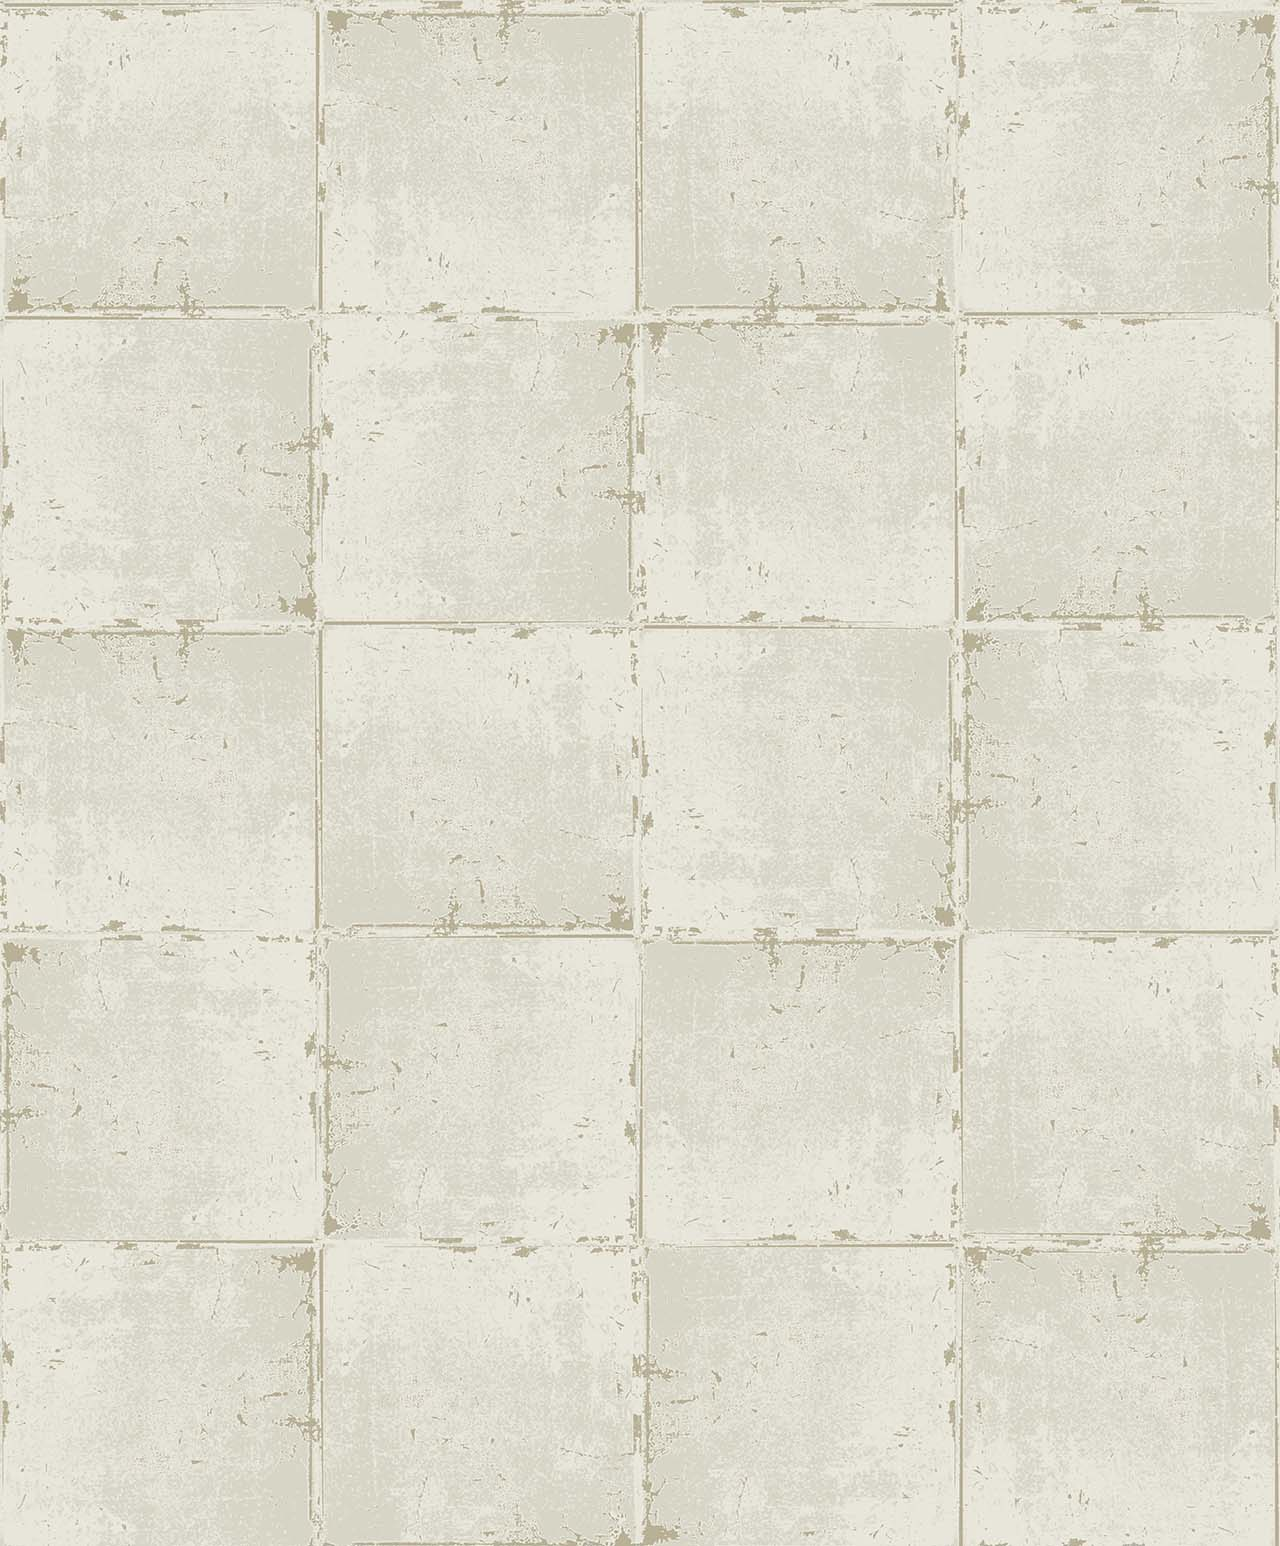 ESQUIRE BEIGE A Milan-Wallpaper-CO00142